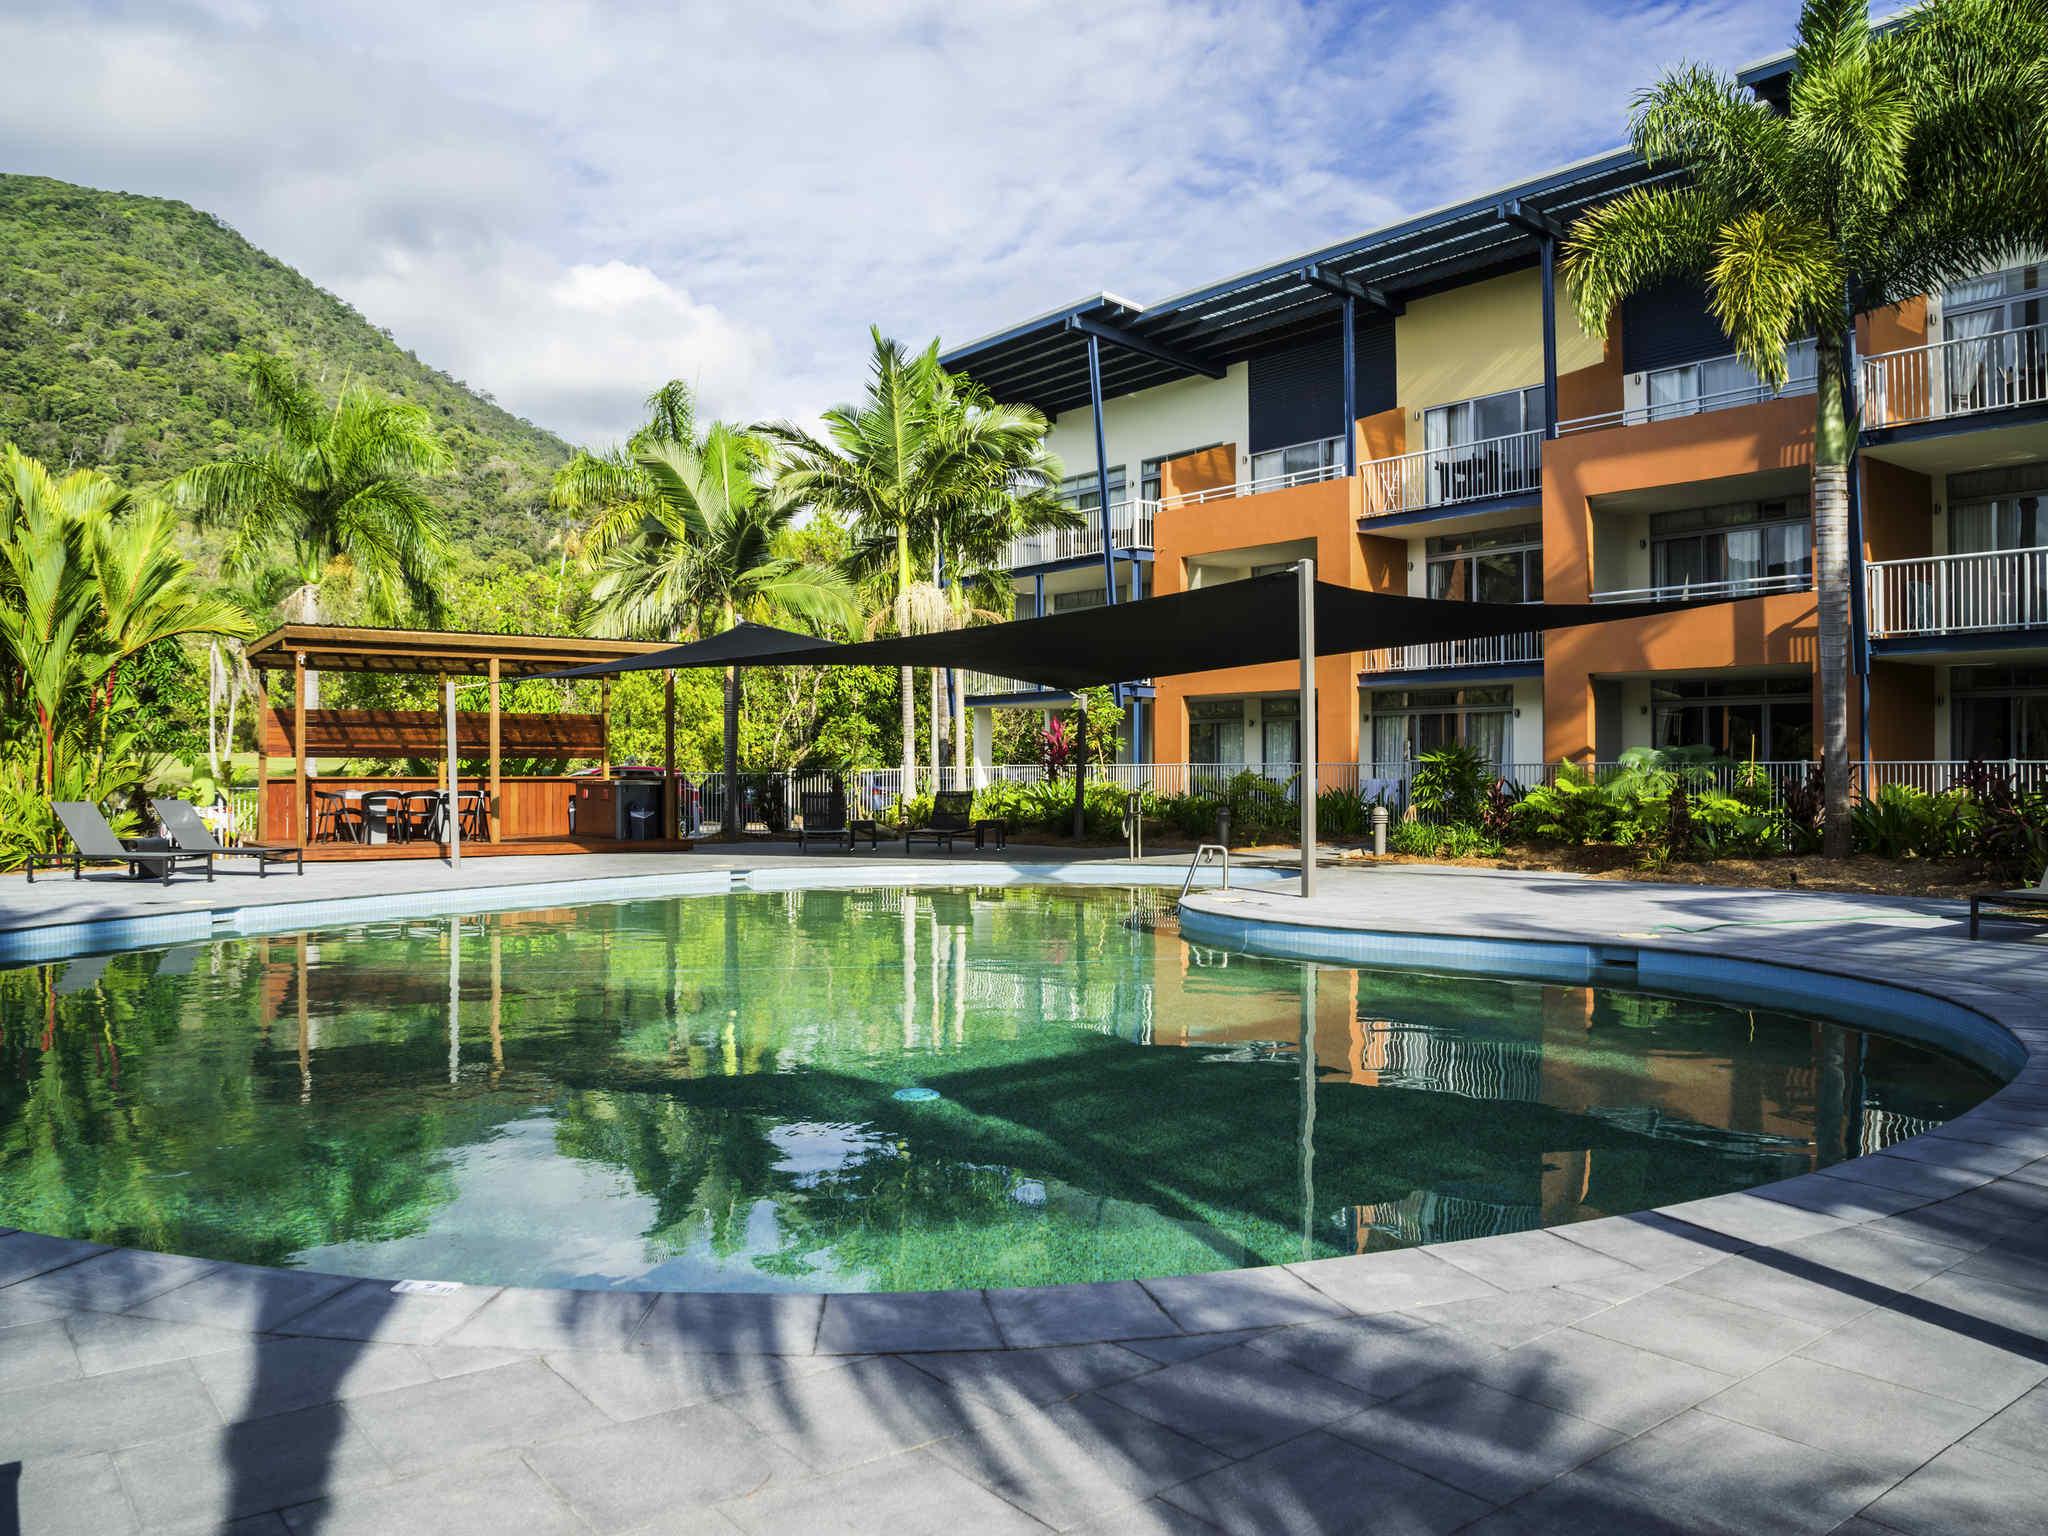 فندق - The Sebel Palm Cove Coral Coast